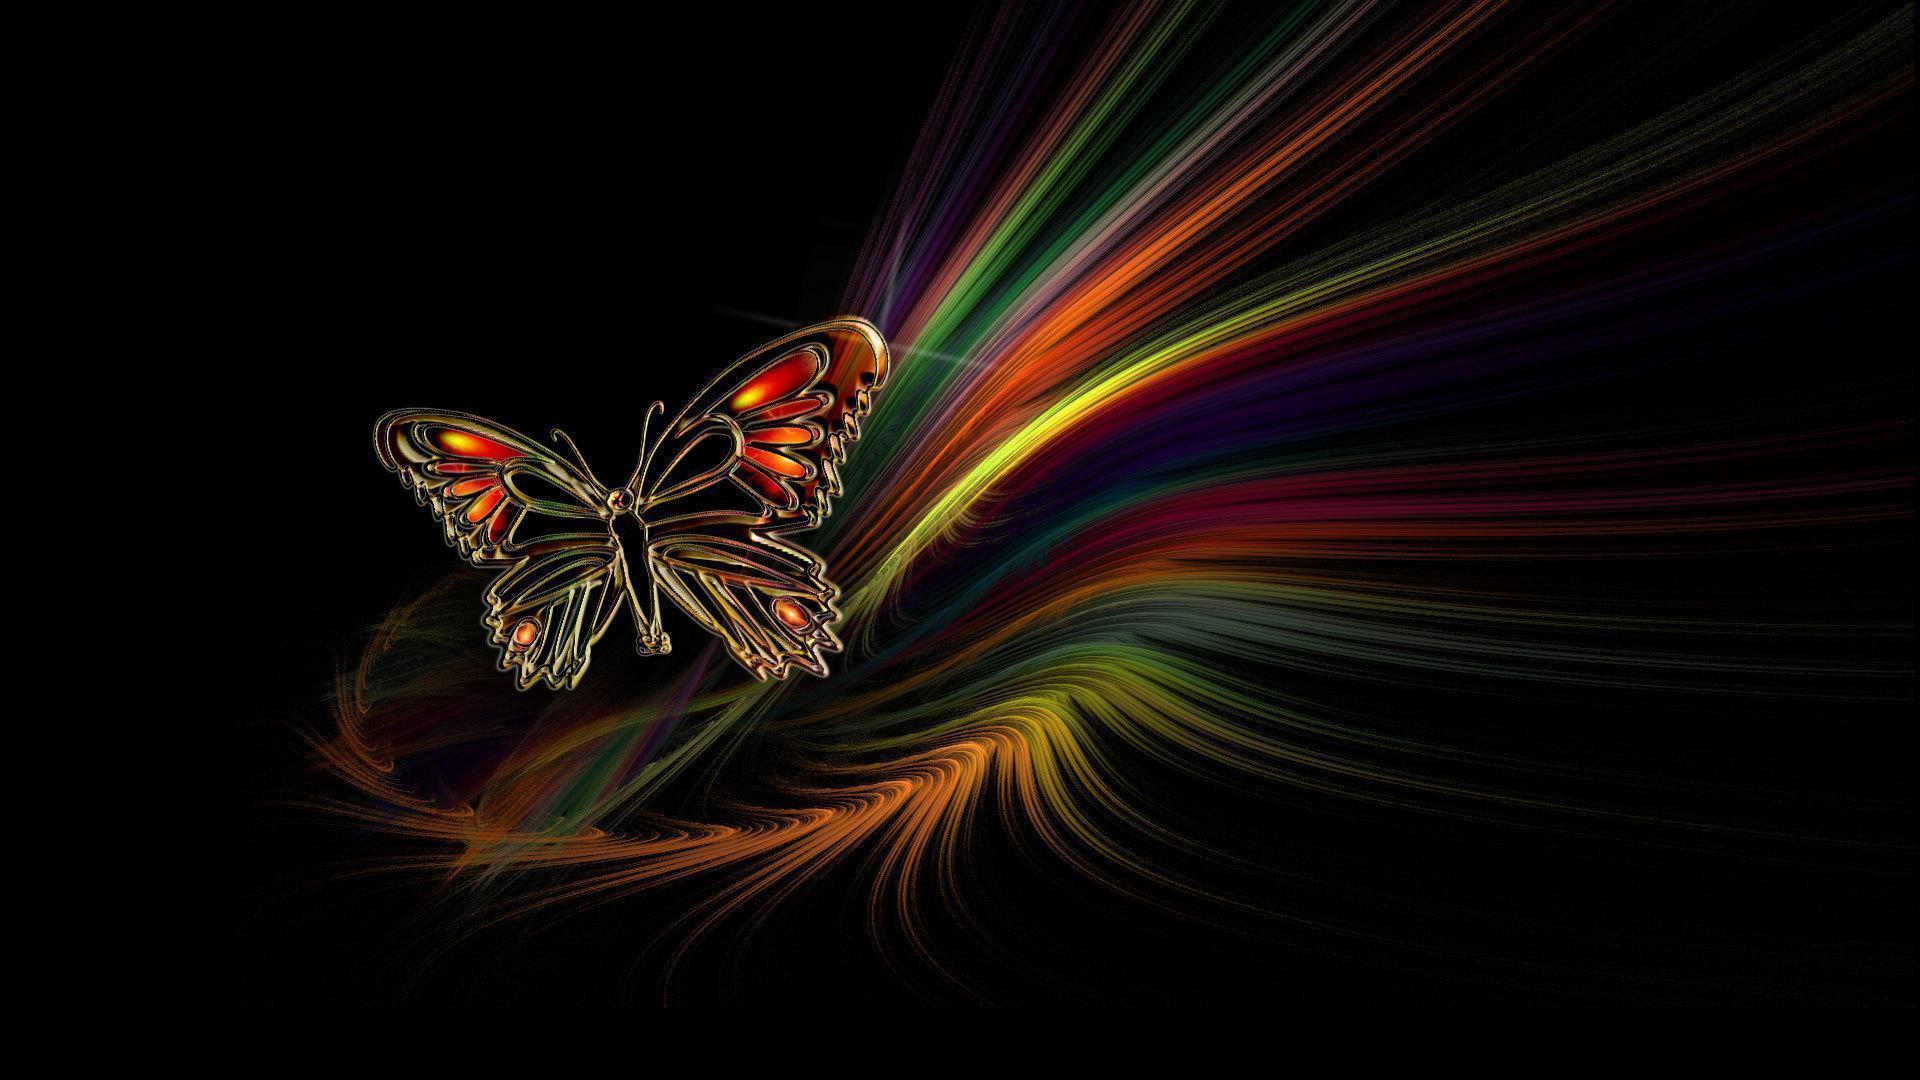 Butterfly Wallpapers Free Download Wallpapers Desktop Wallpaper